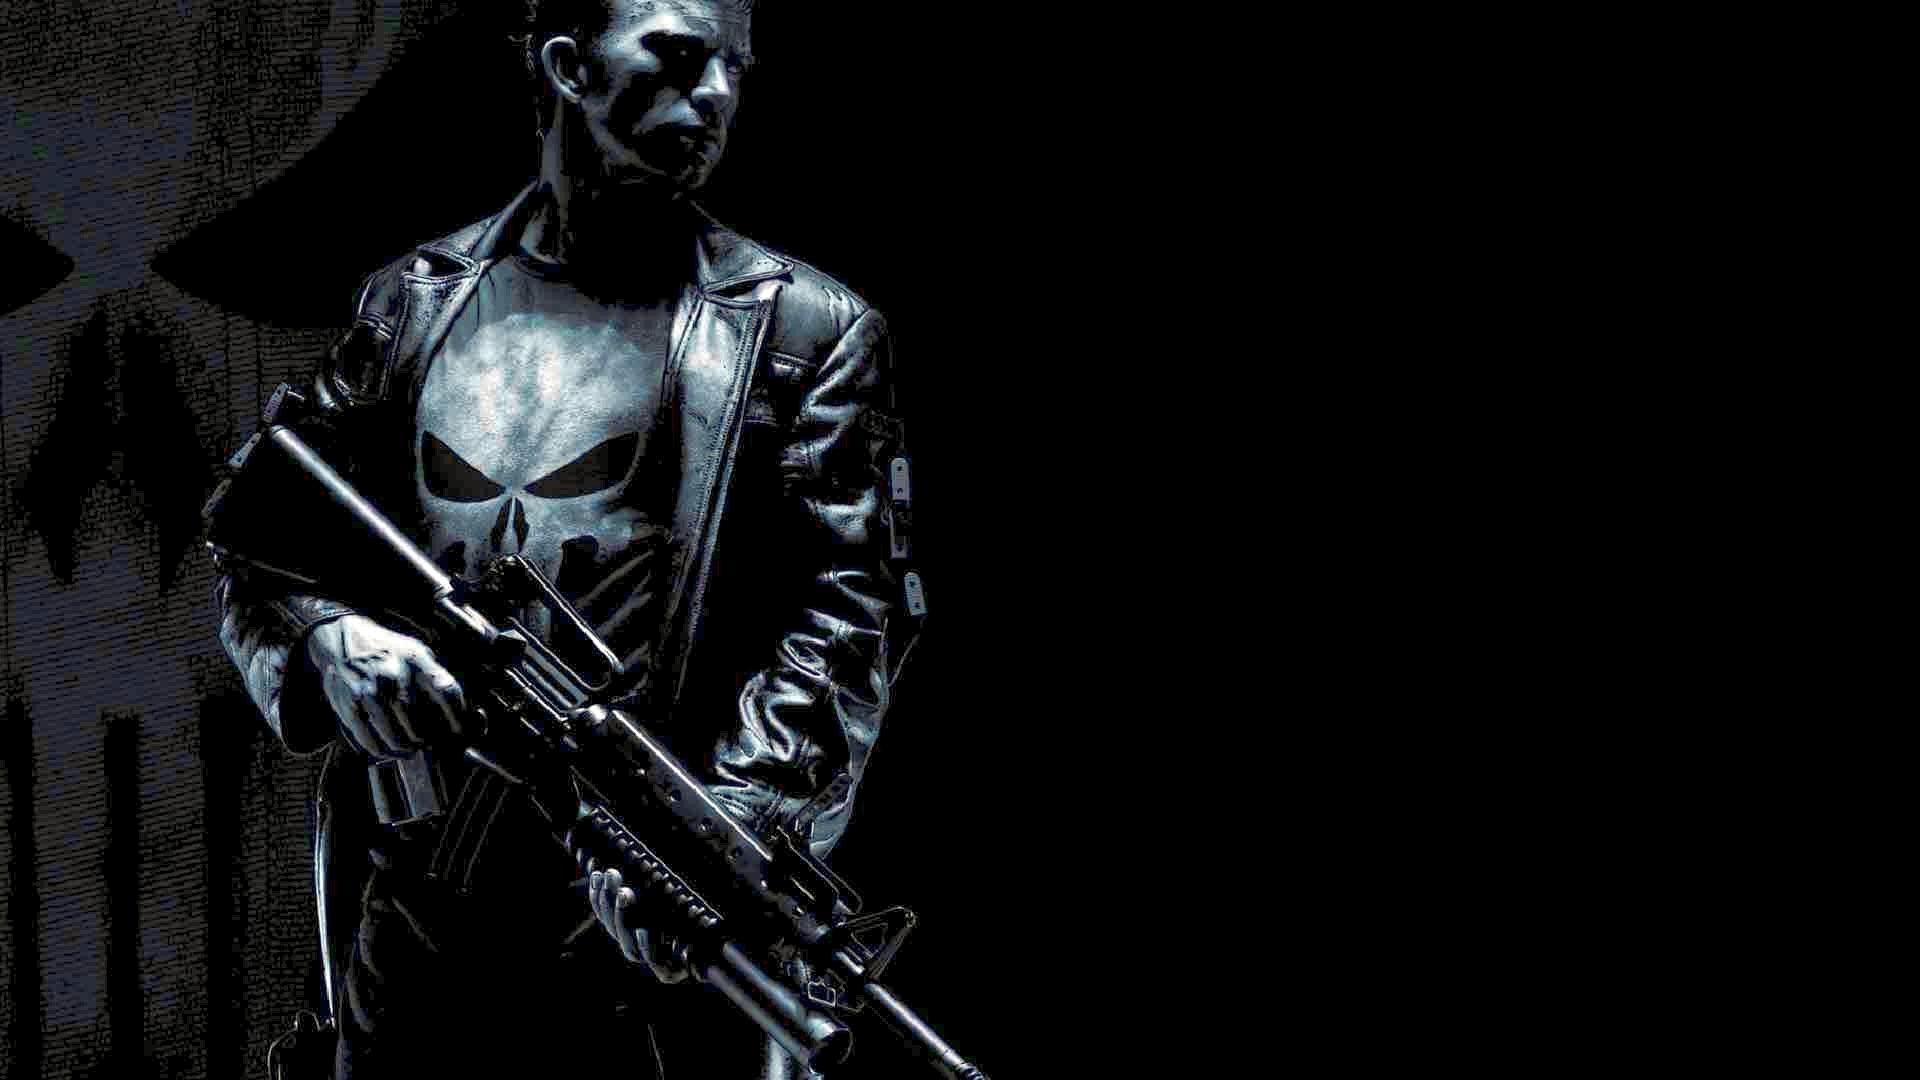 The Punisher (2004) Computer Wallpapers, Desktop Backgrounds .